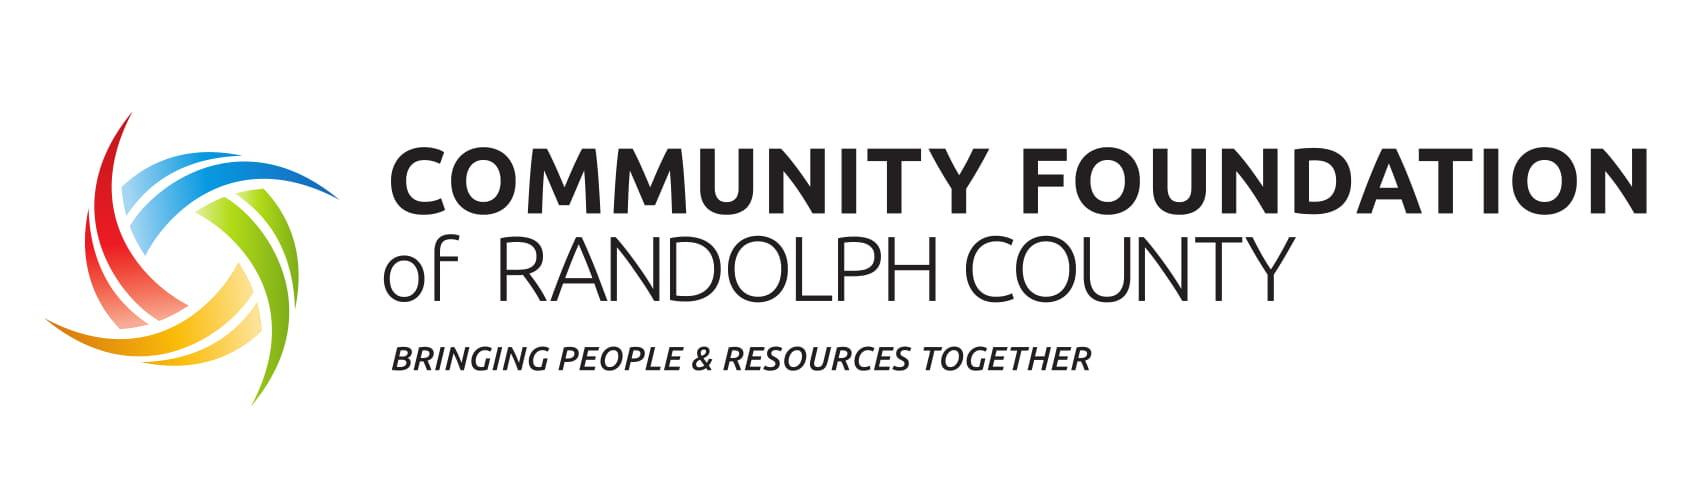 Community Foundation of Randolph County